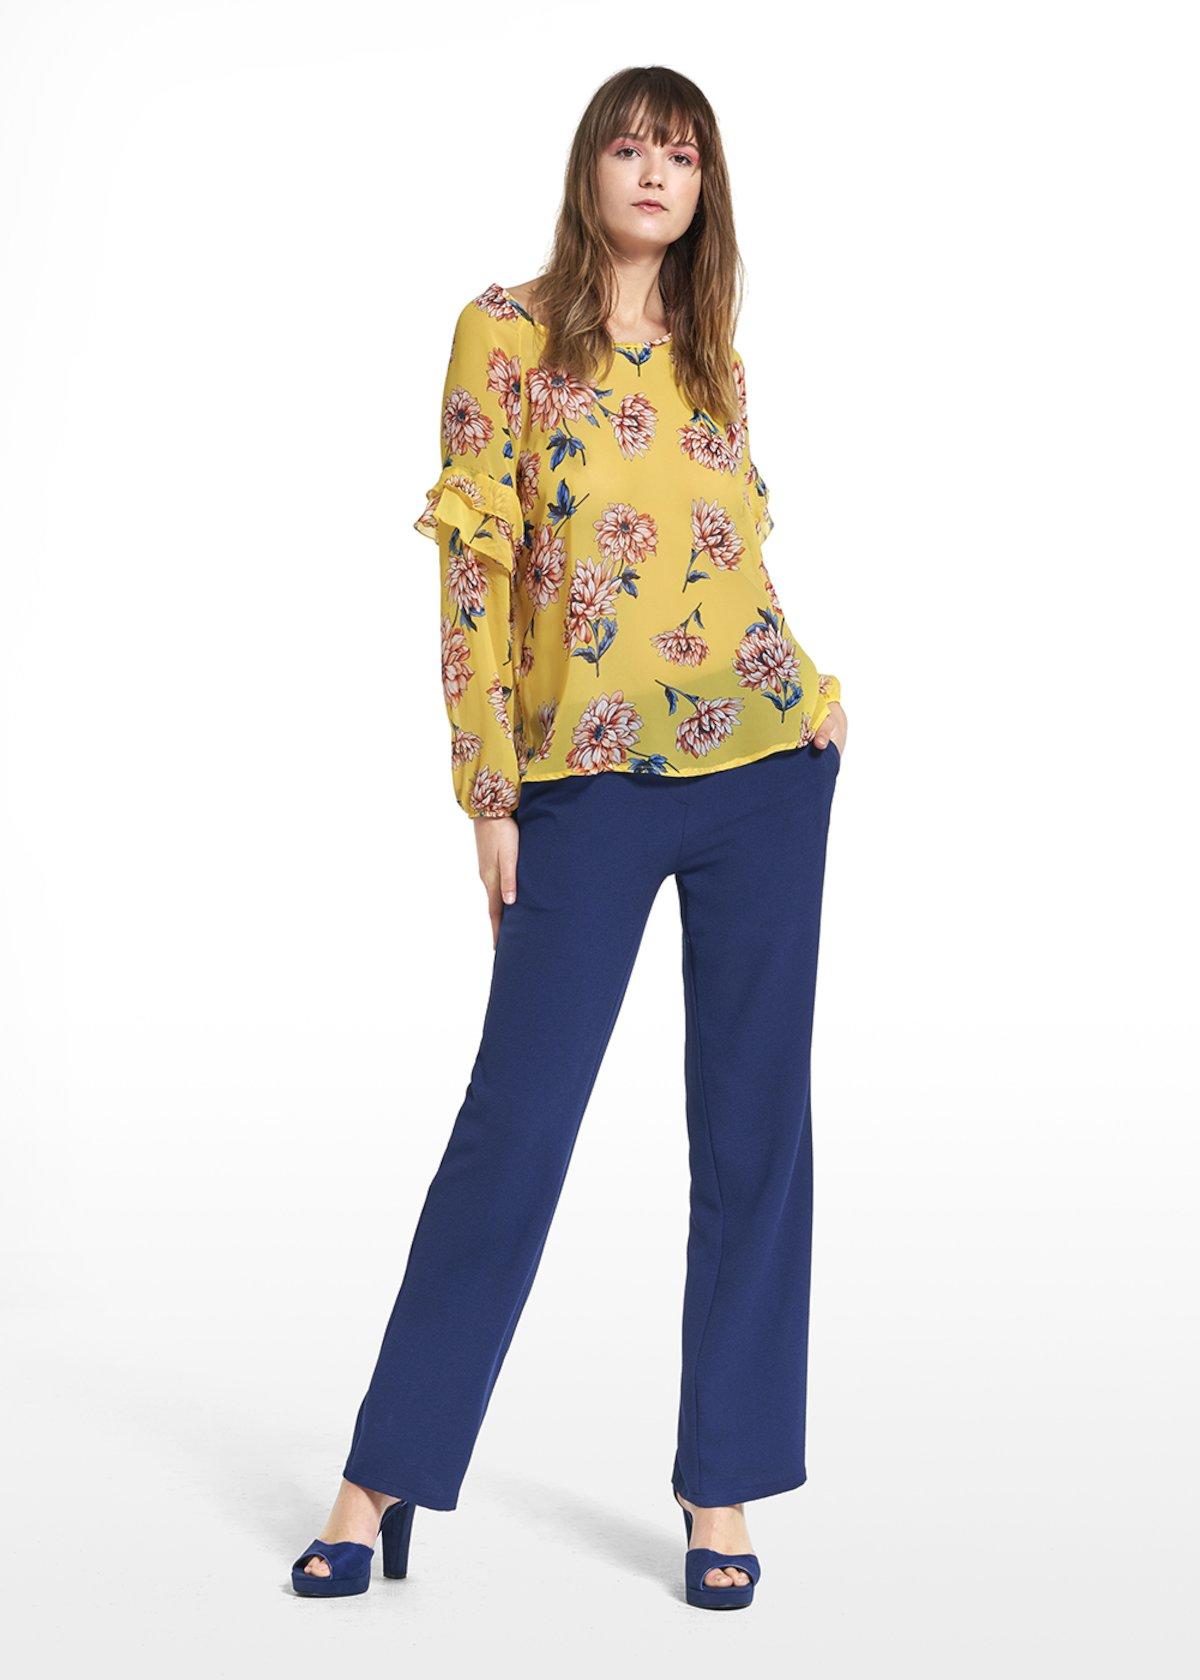 Shirt Crimea with Tahiti pattern - Ananas / Calcite Fantasia - Woman - Category image